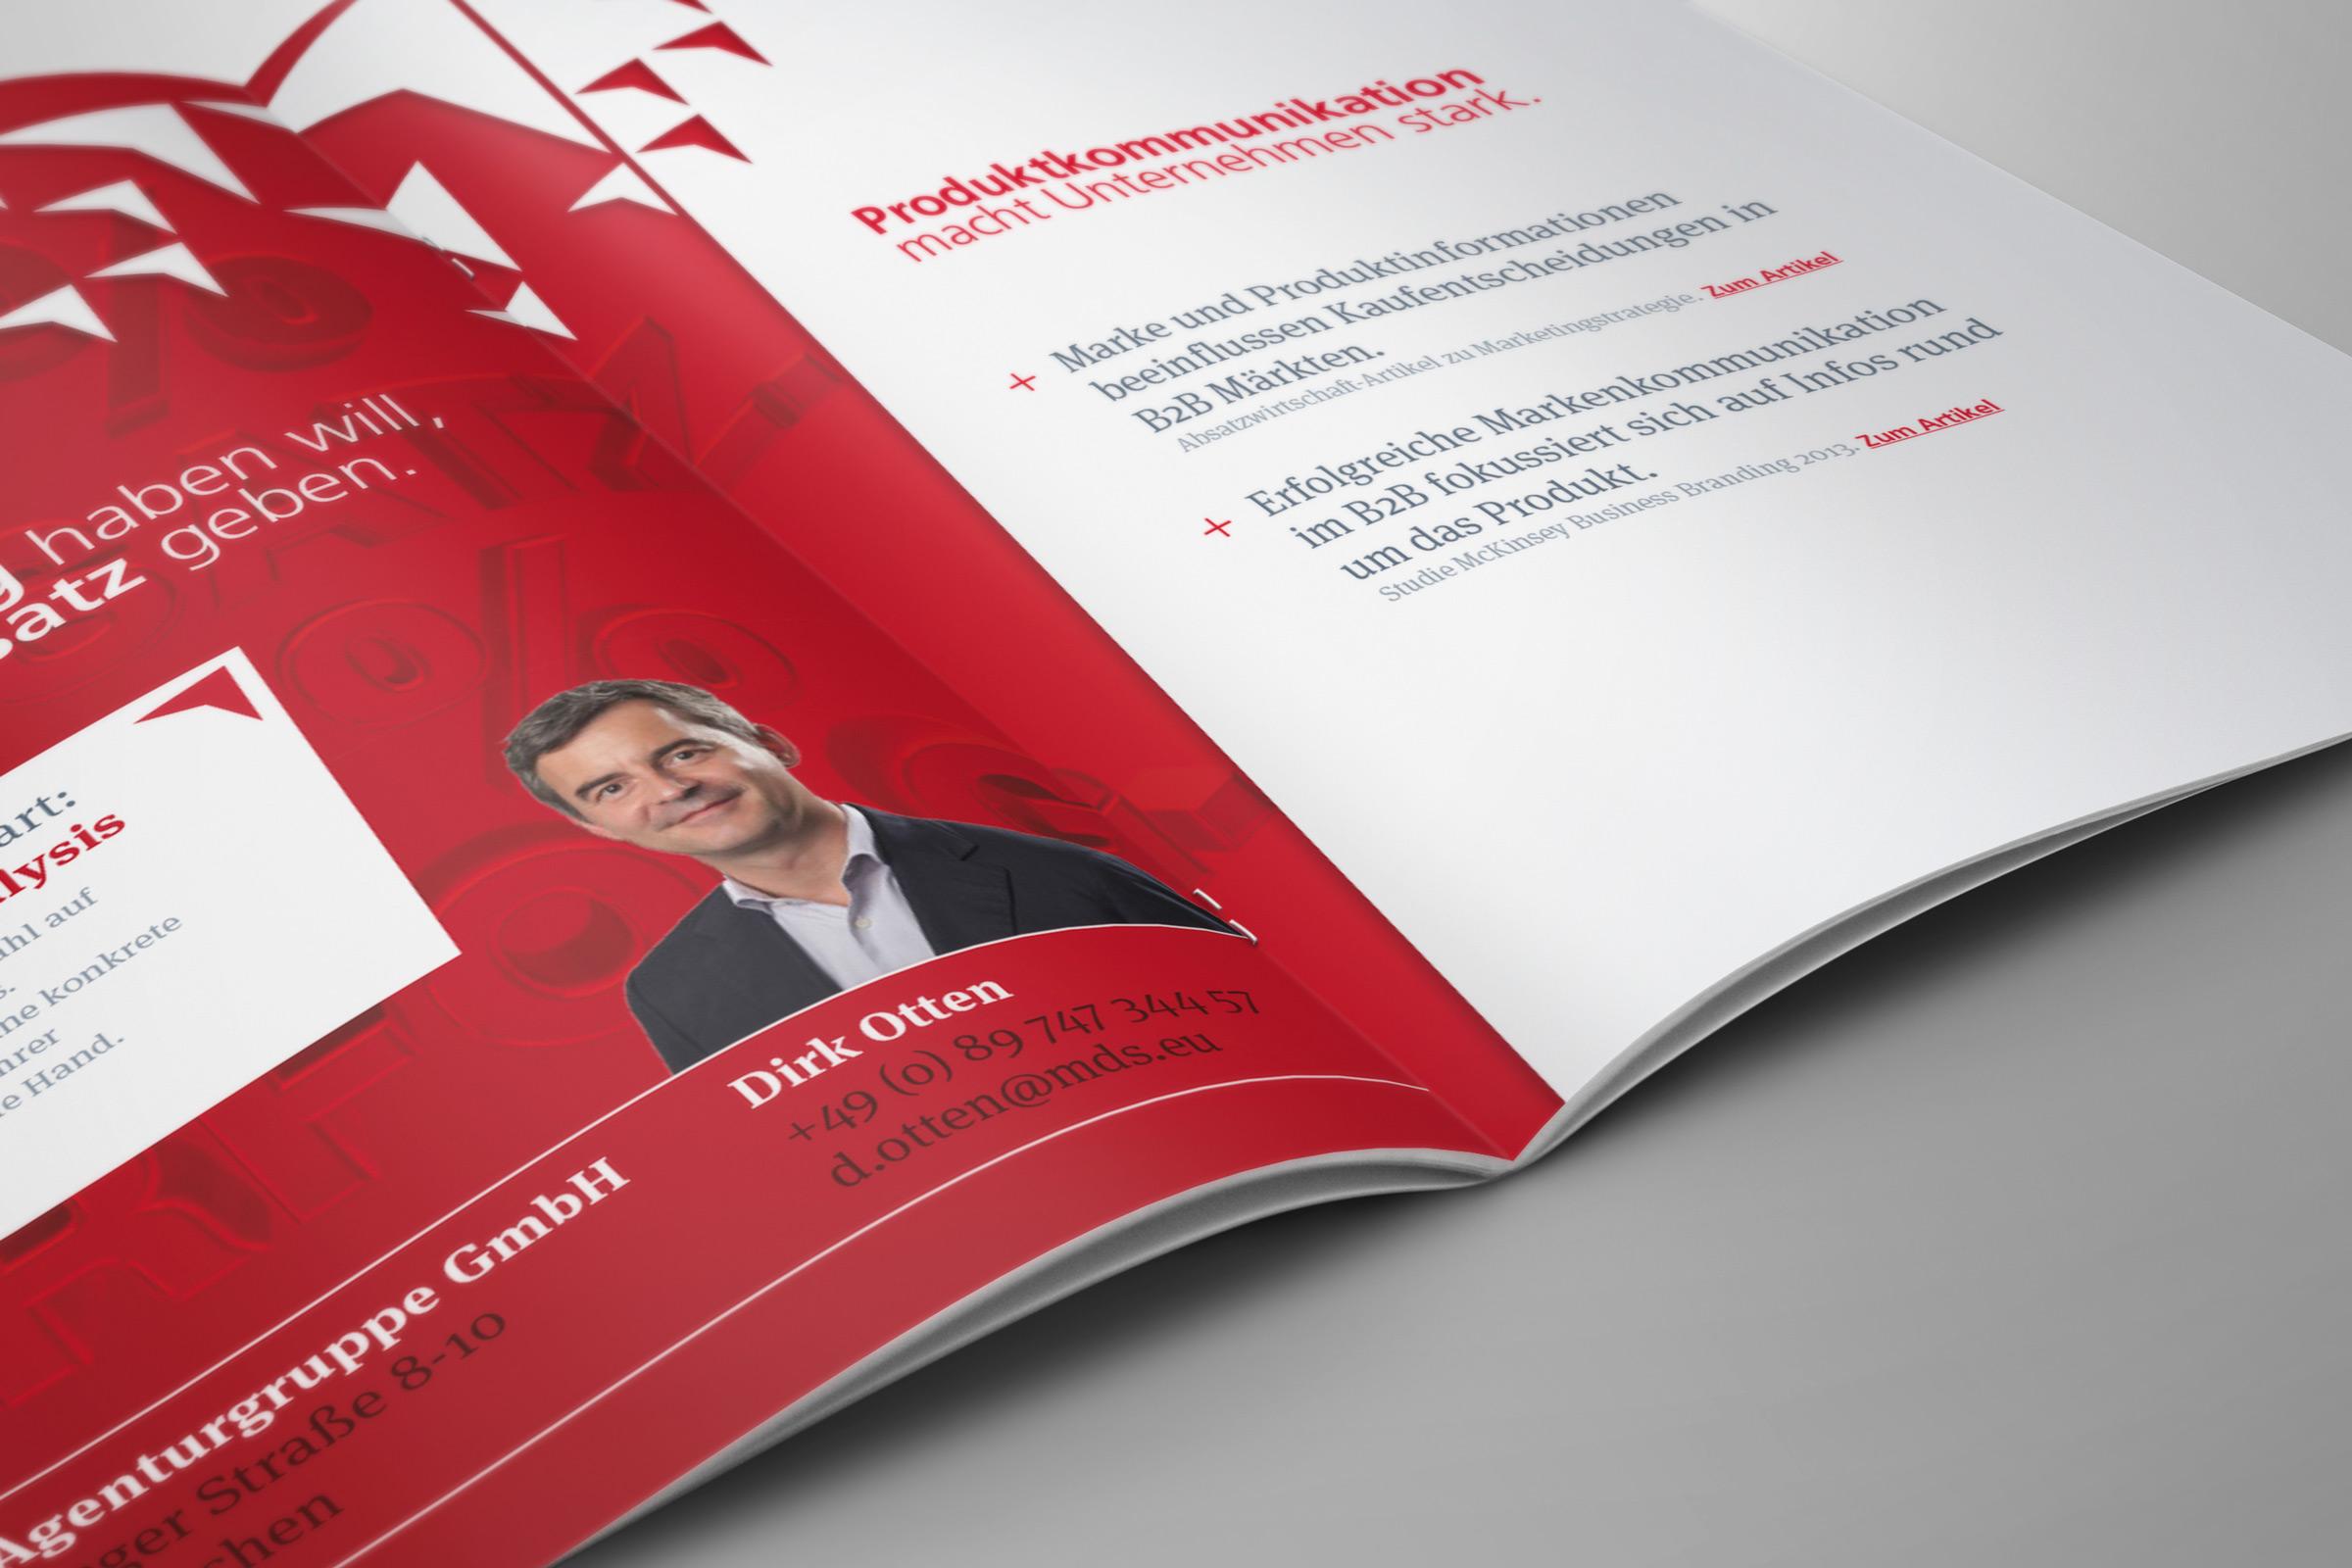 Benschmark Corporate Designagentur München